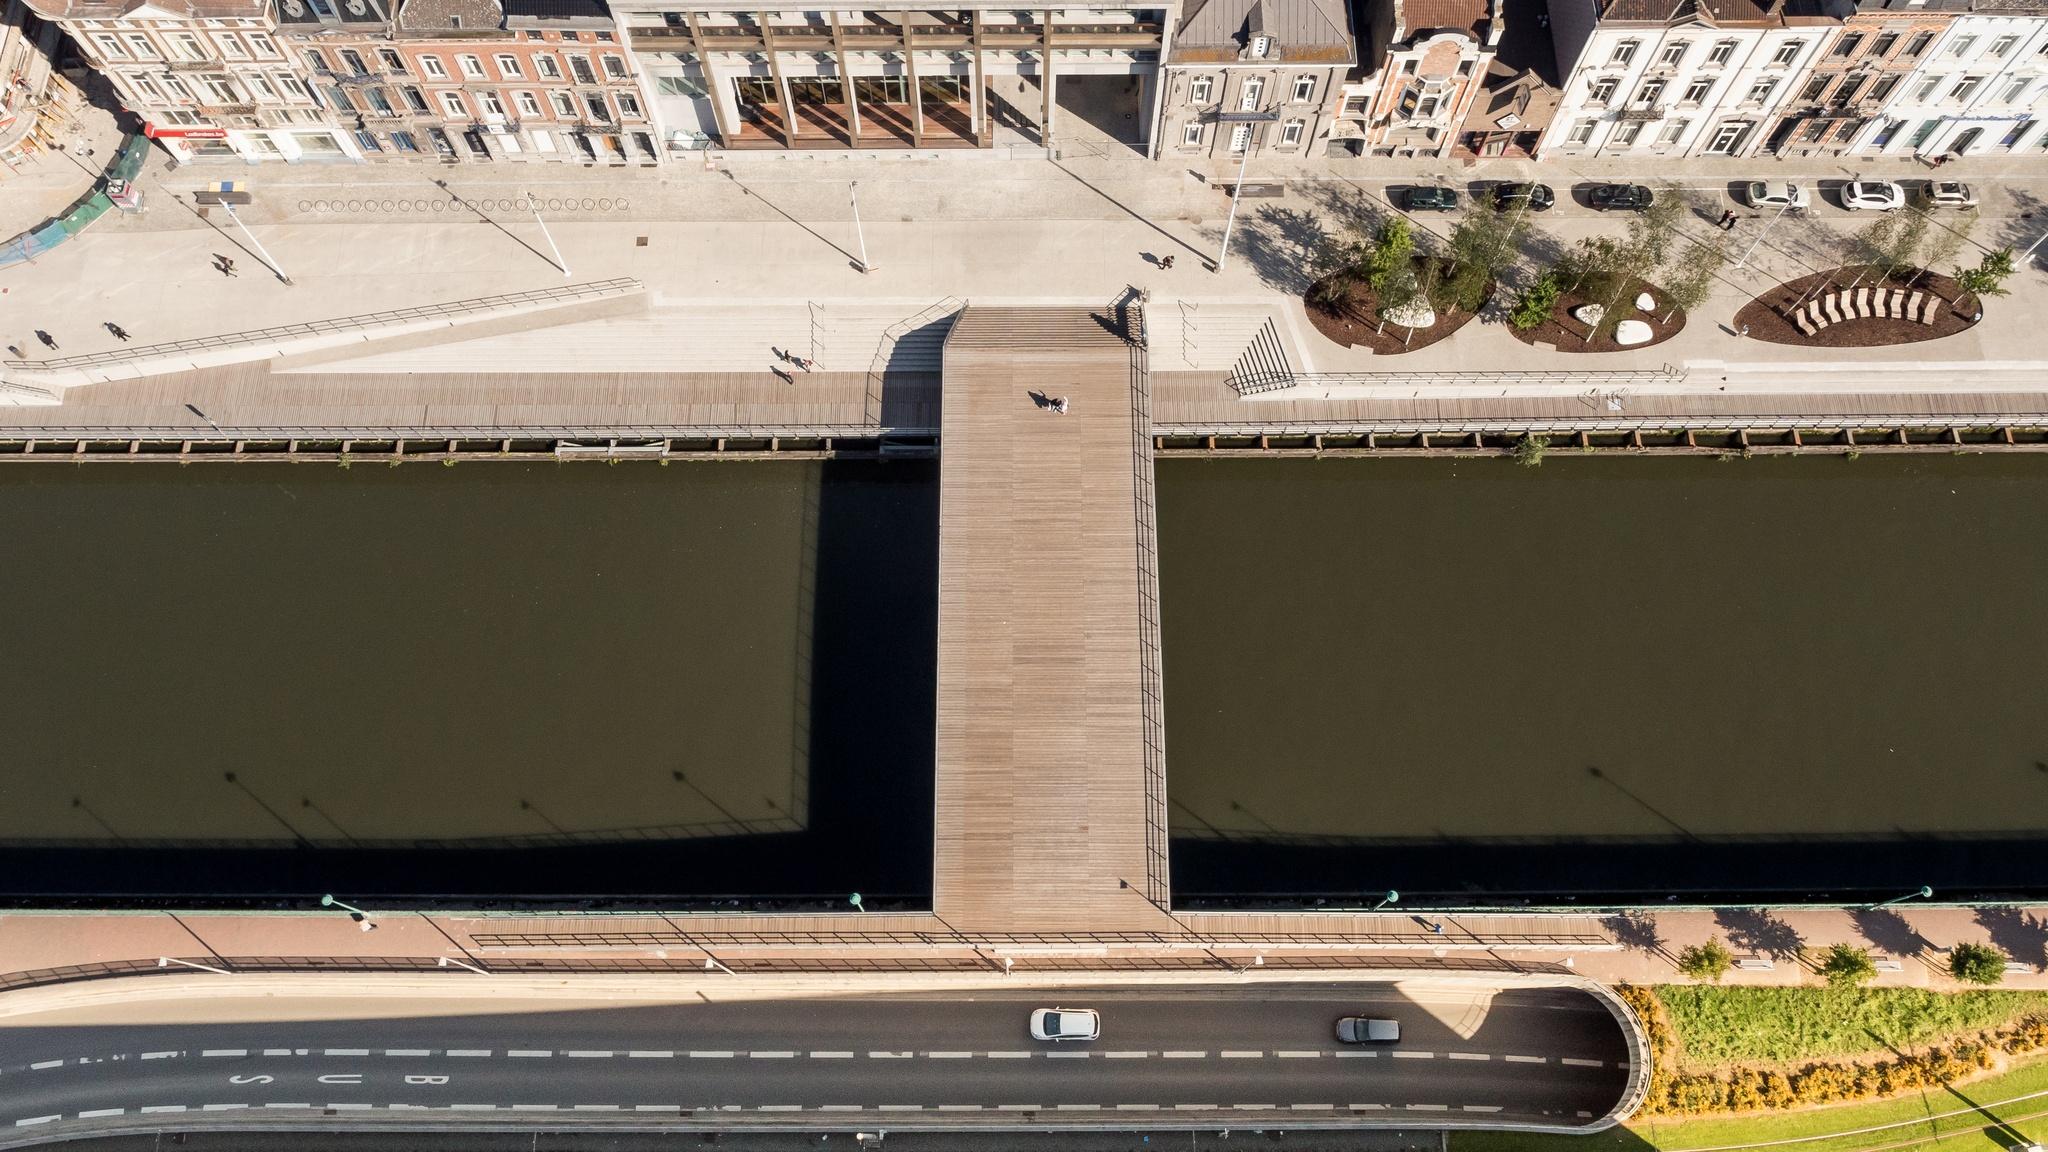 Phenix 458   Arrangement of the quays along the Sambre and realisation of a footbridge